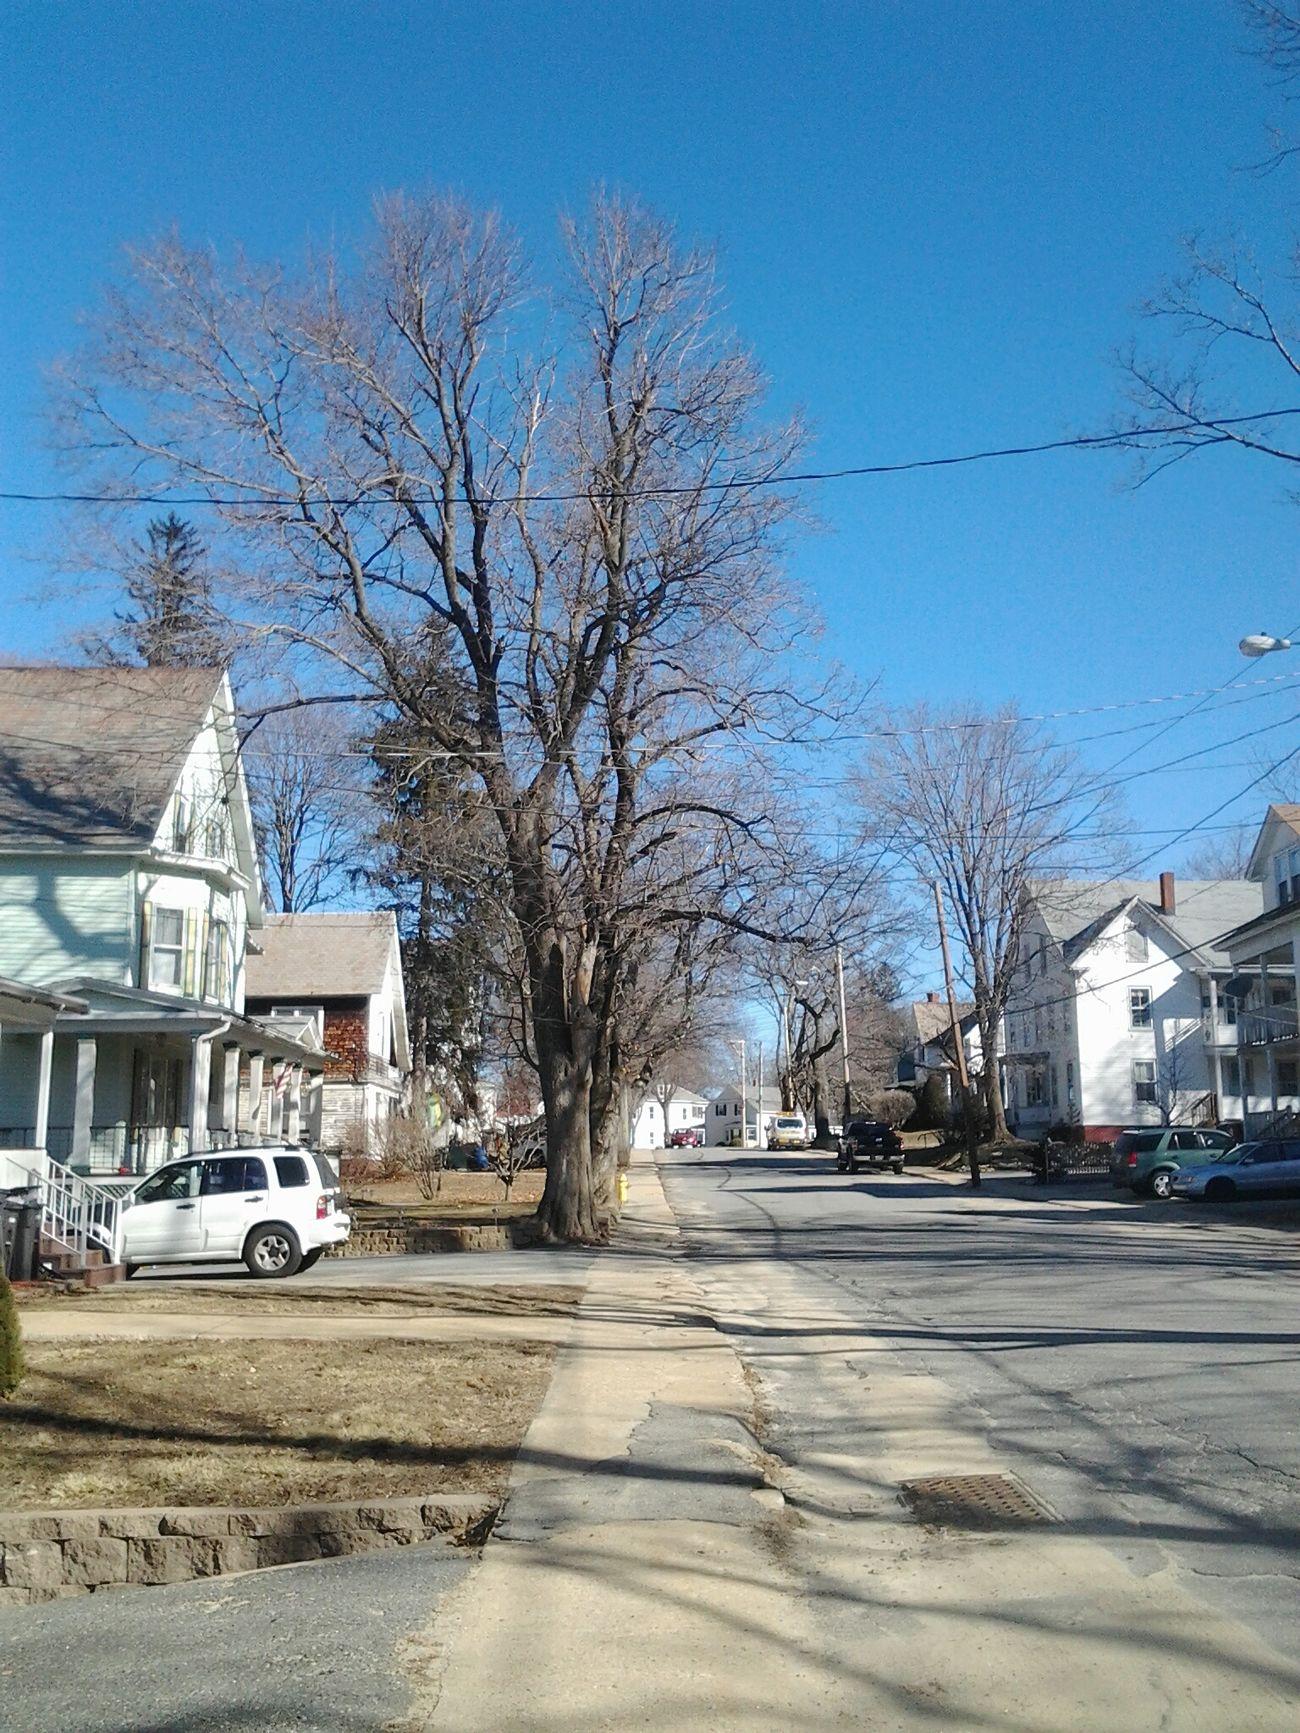 Pictureoftheday Autismawareness Massachusetts Streetphotography Picsforautism